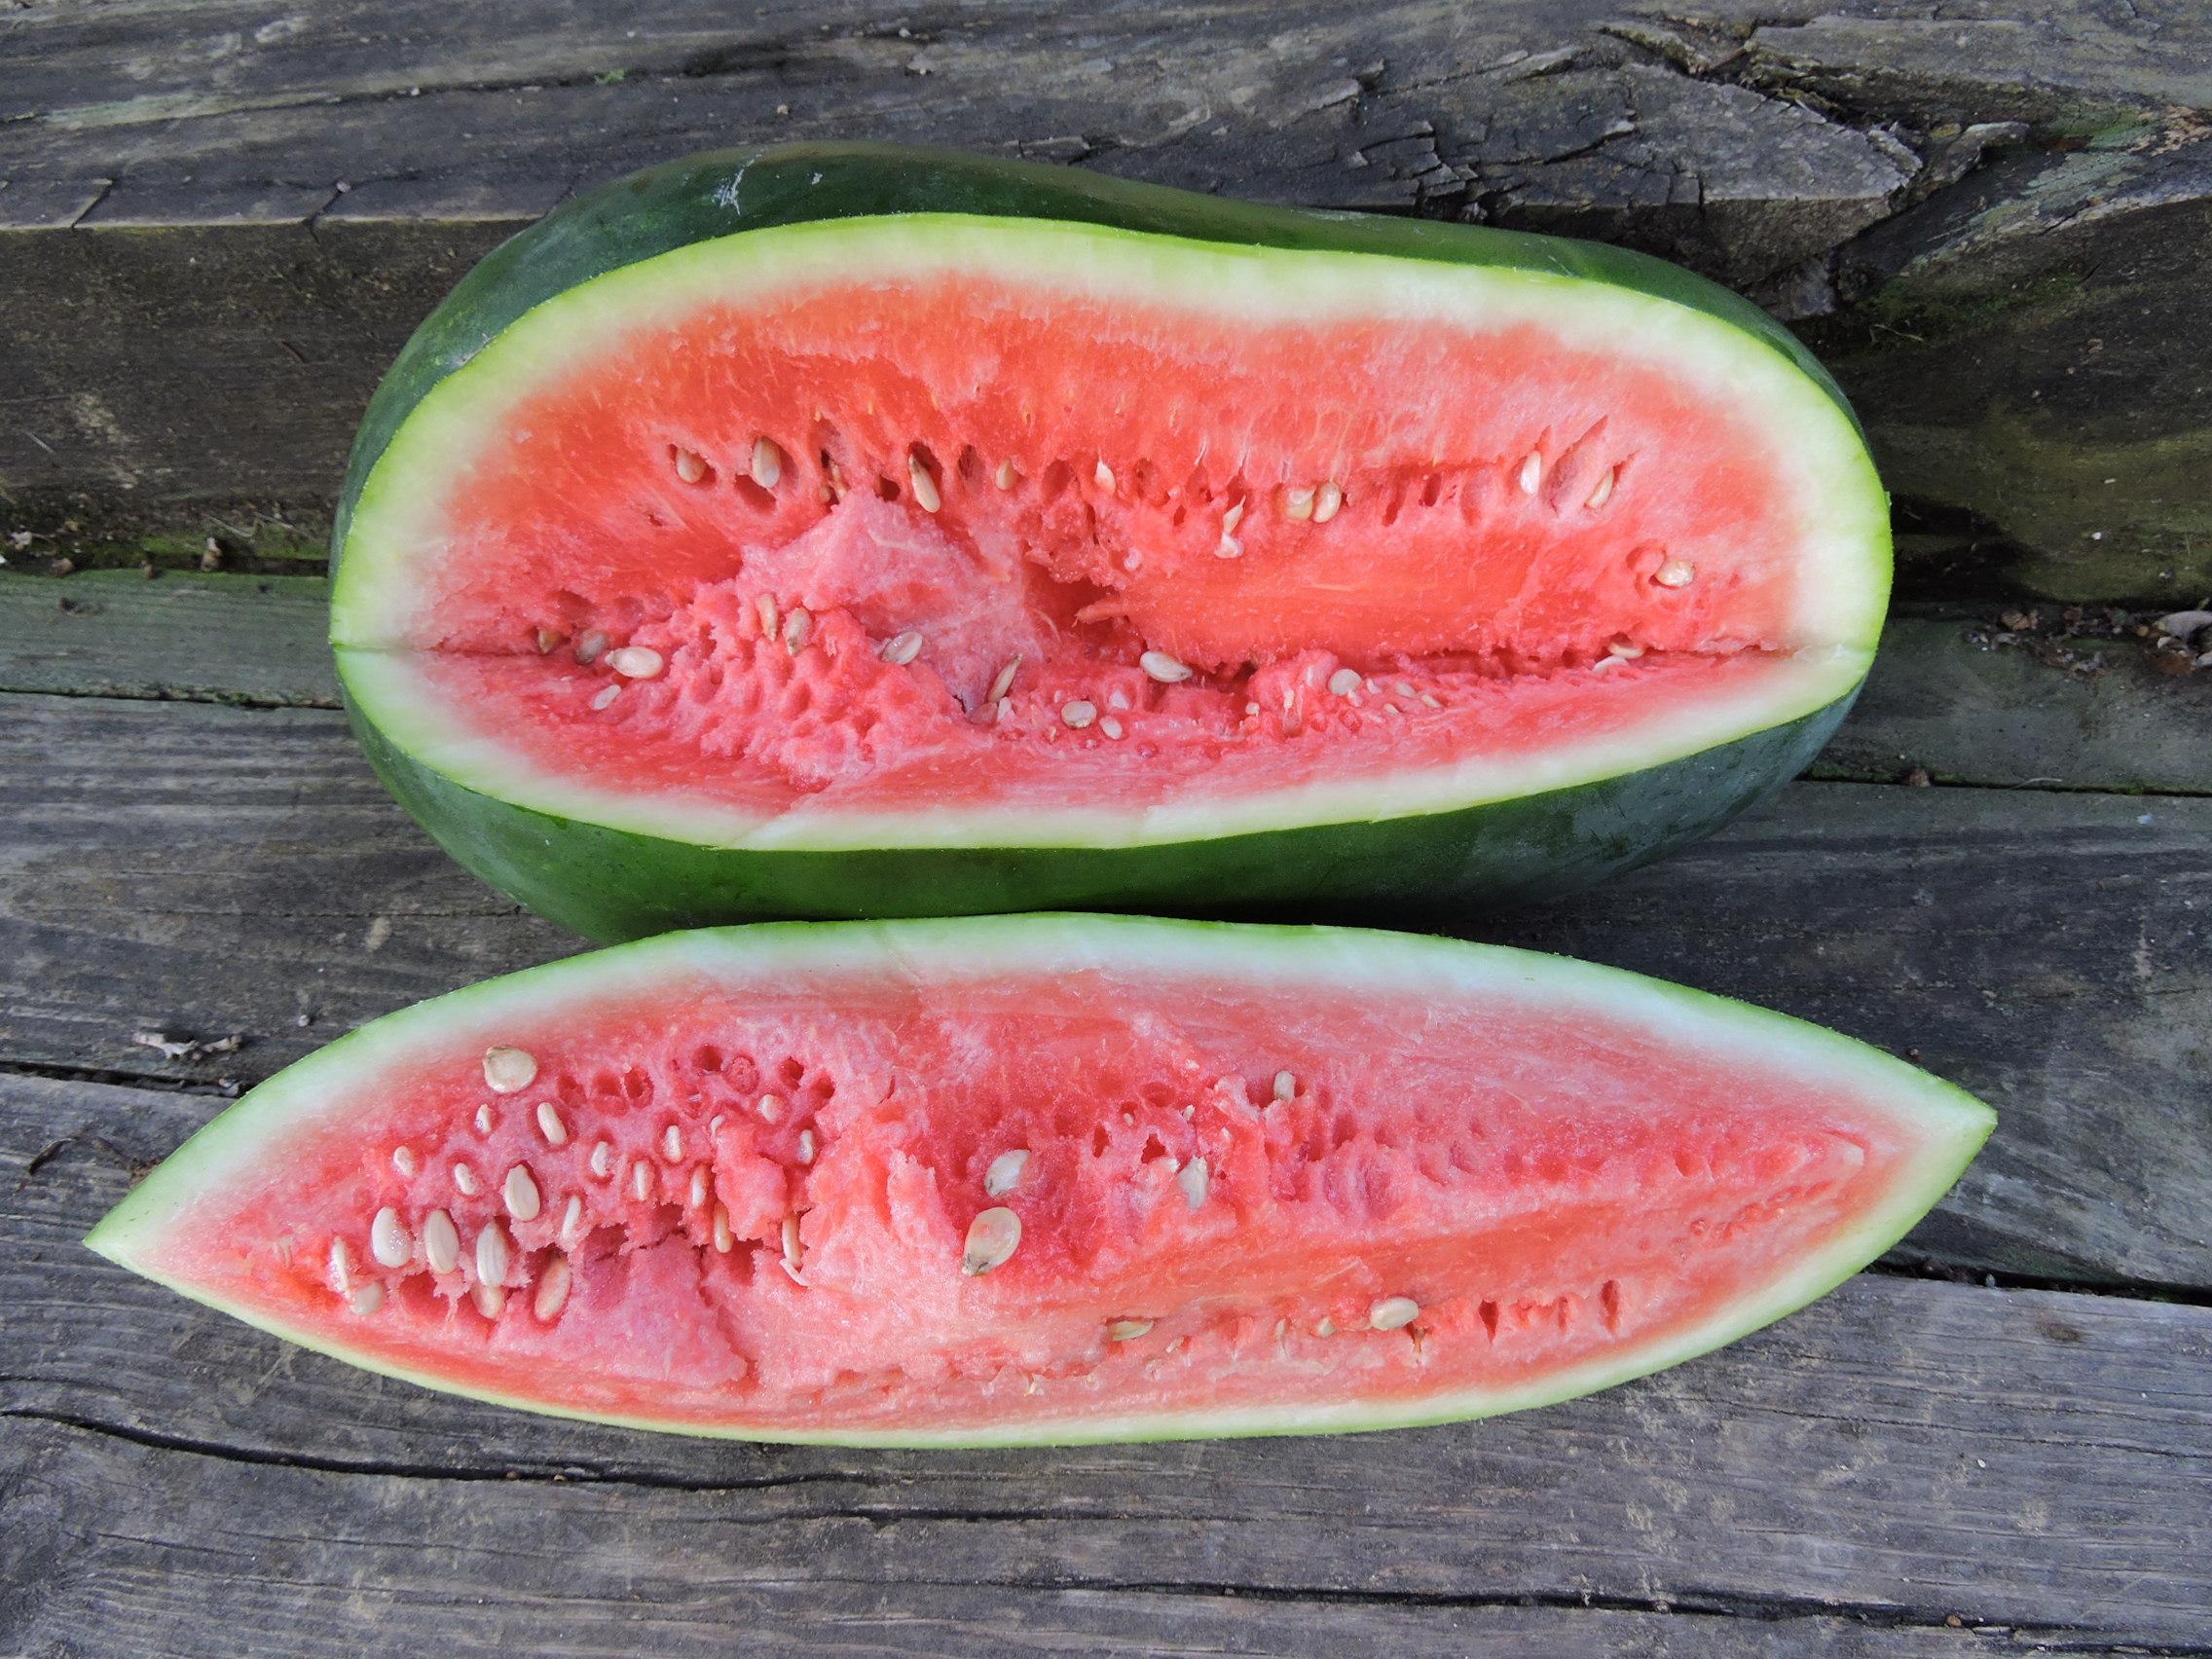 Halbert Honey Watermelon